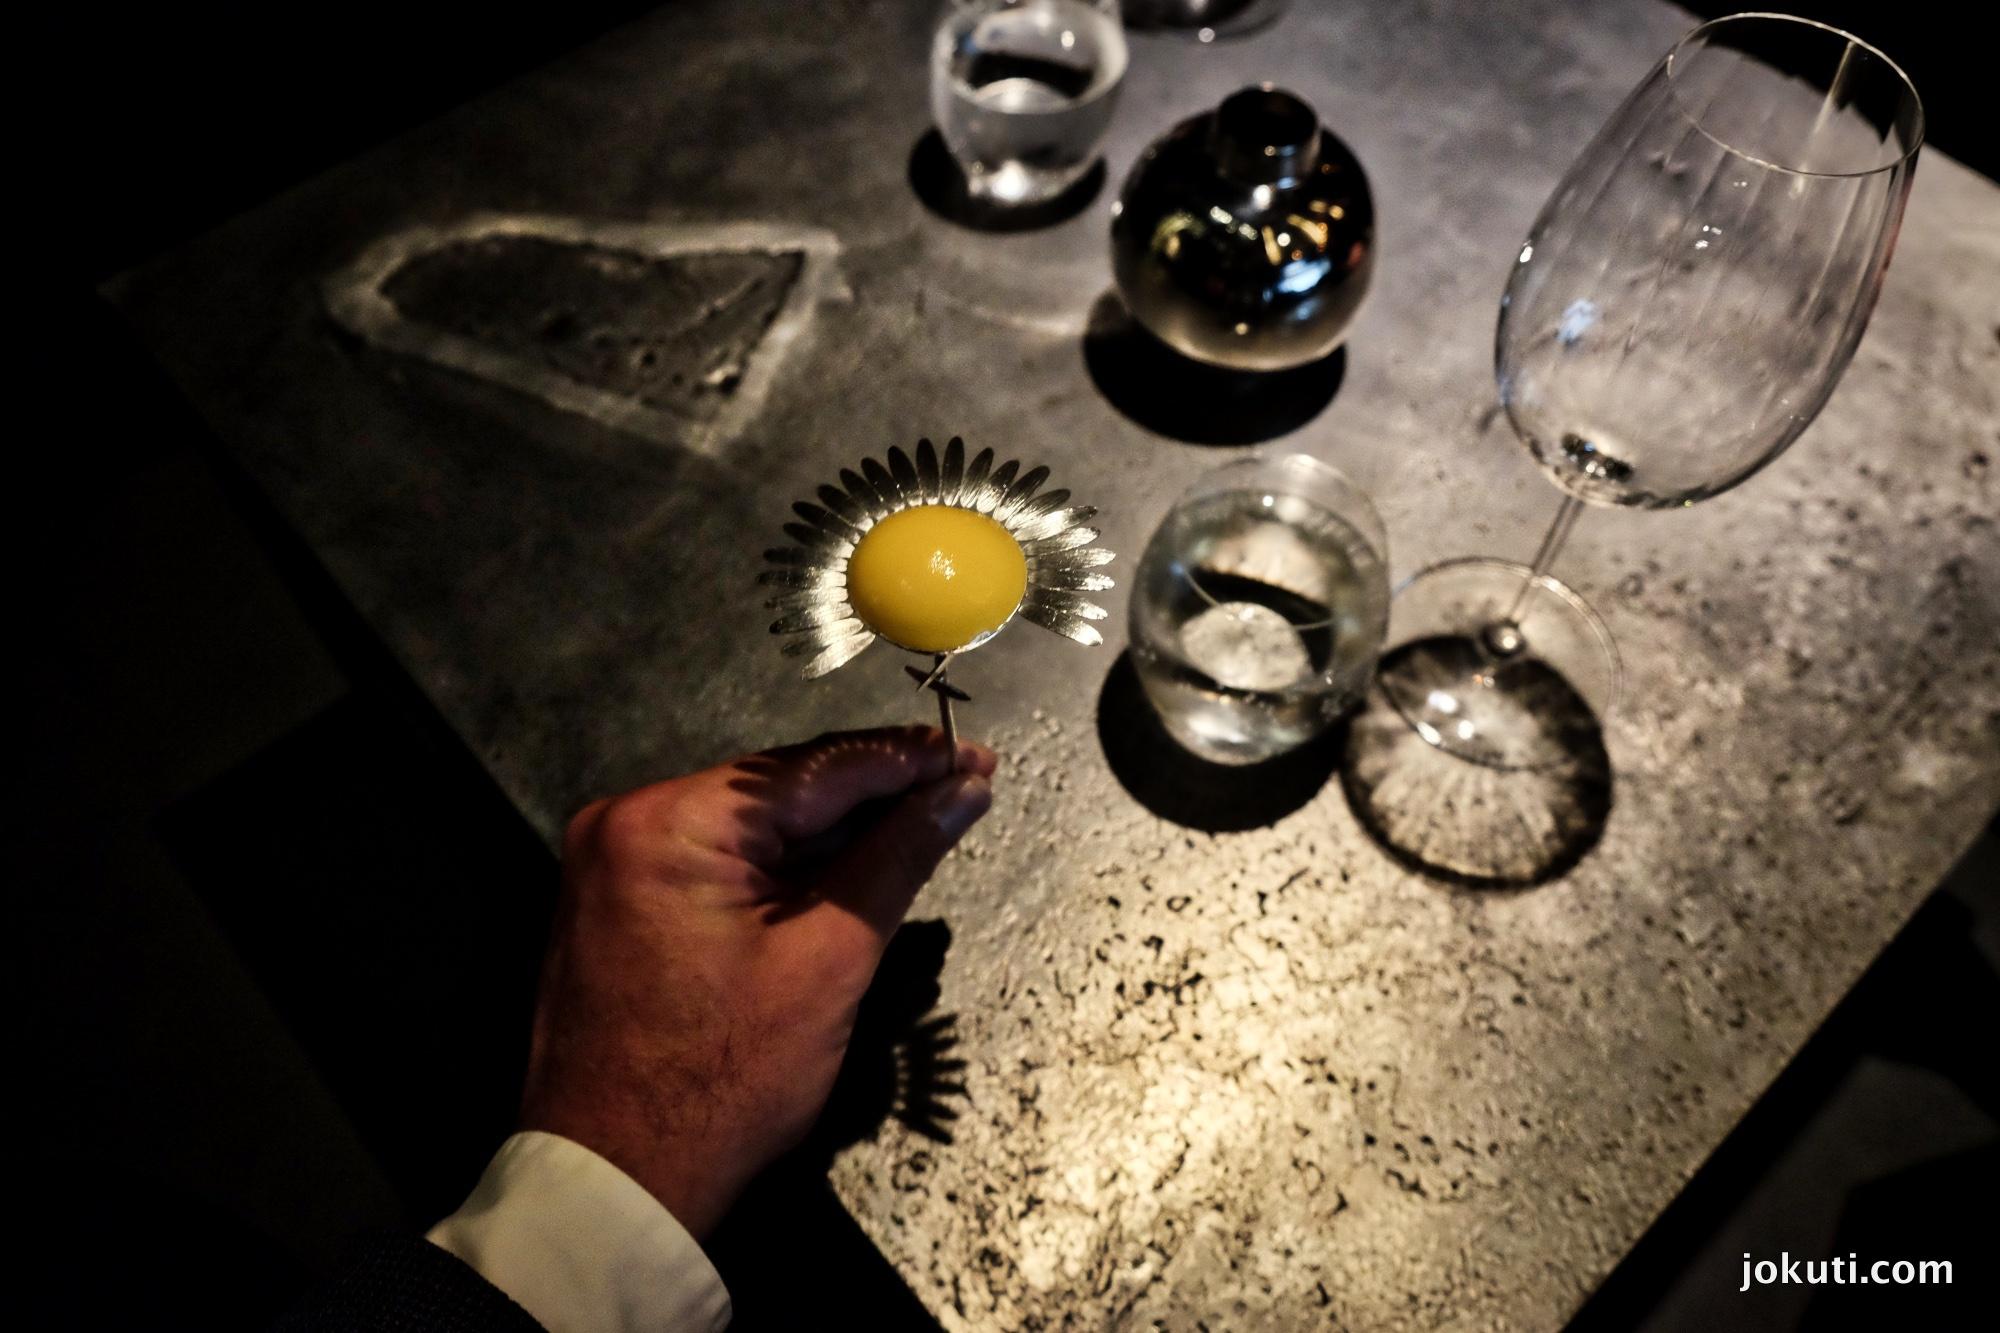 dscf7171_alchemist_copenhagen_rasmus_munk_holistic_dining_restaurant_denmark_vilagevo_jokuti_andras_l.jpg